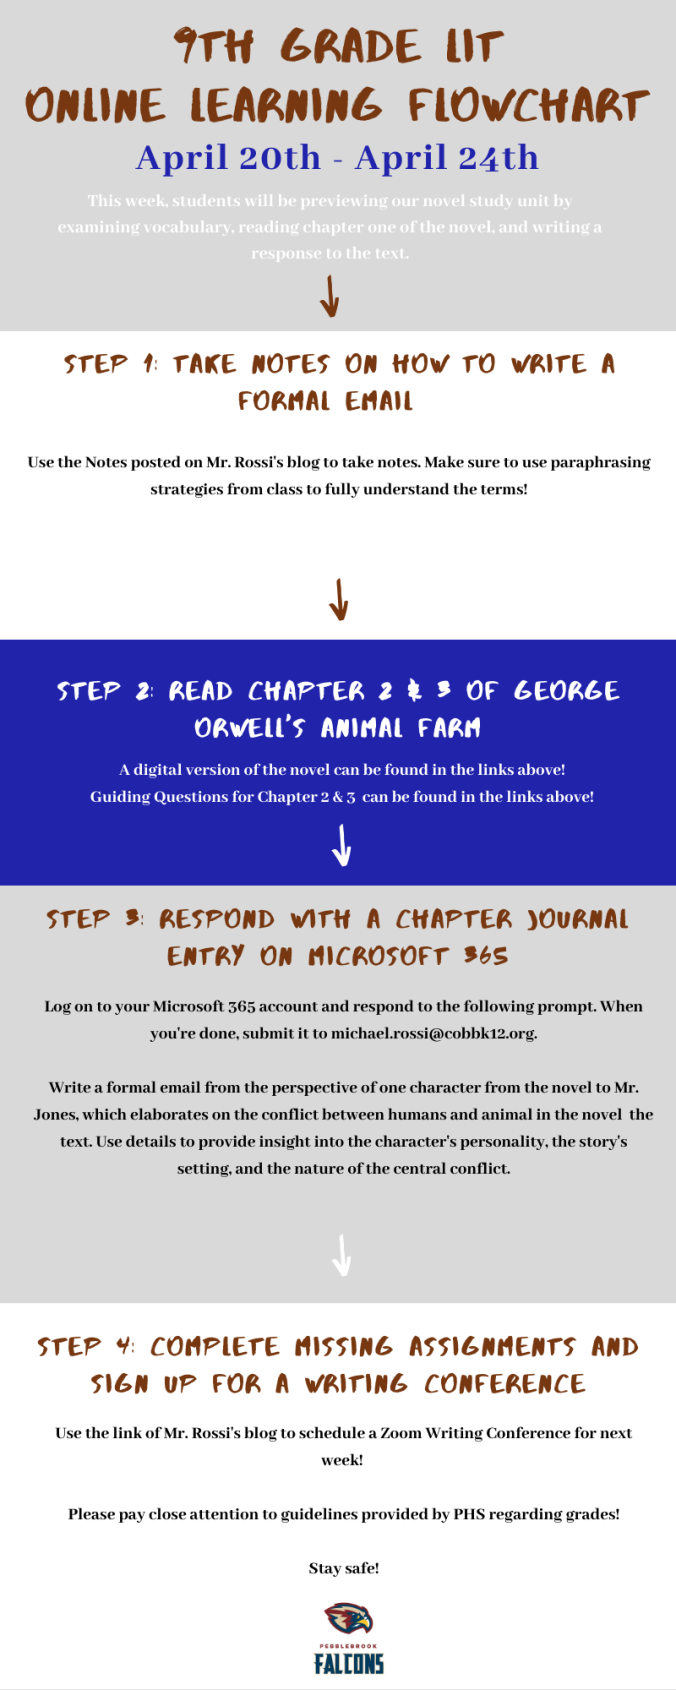 Copy of Online Learning FlowChart (4)